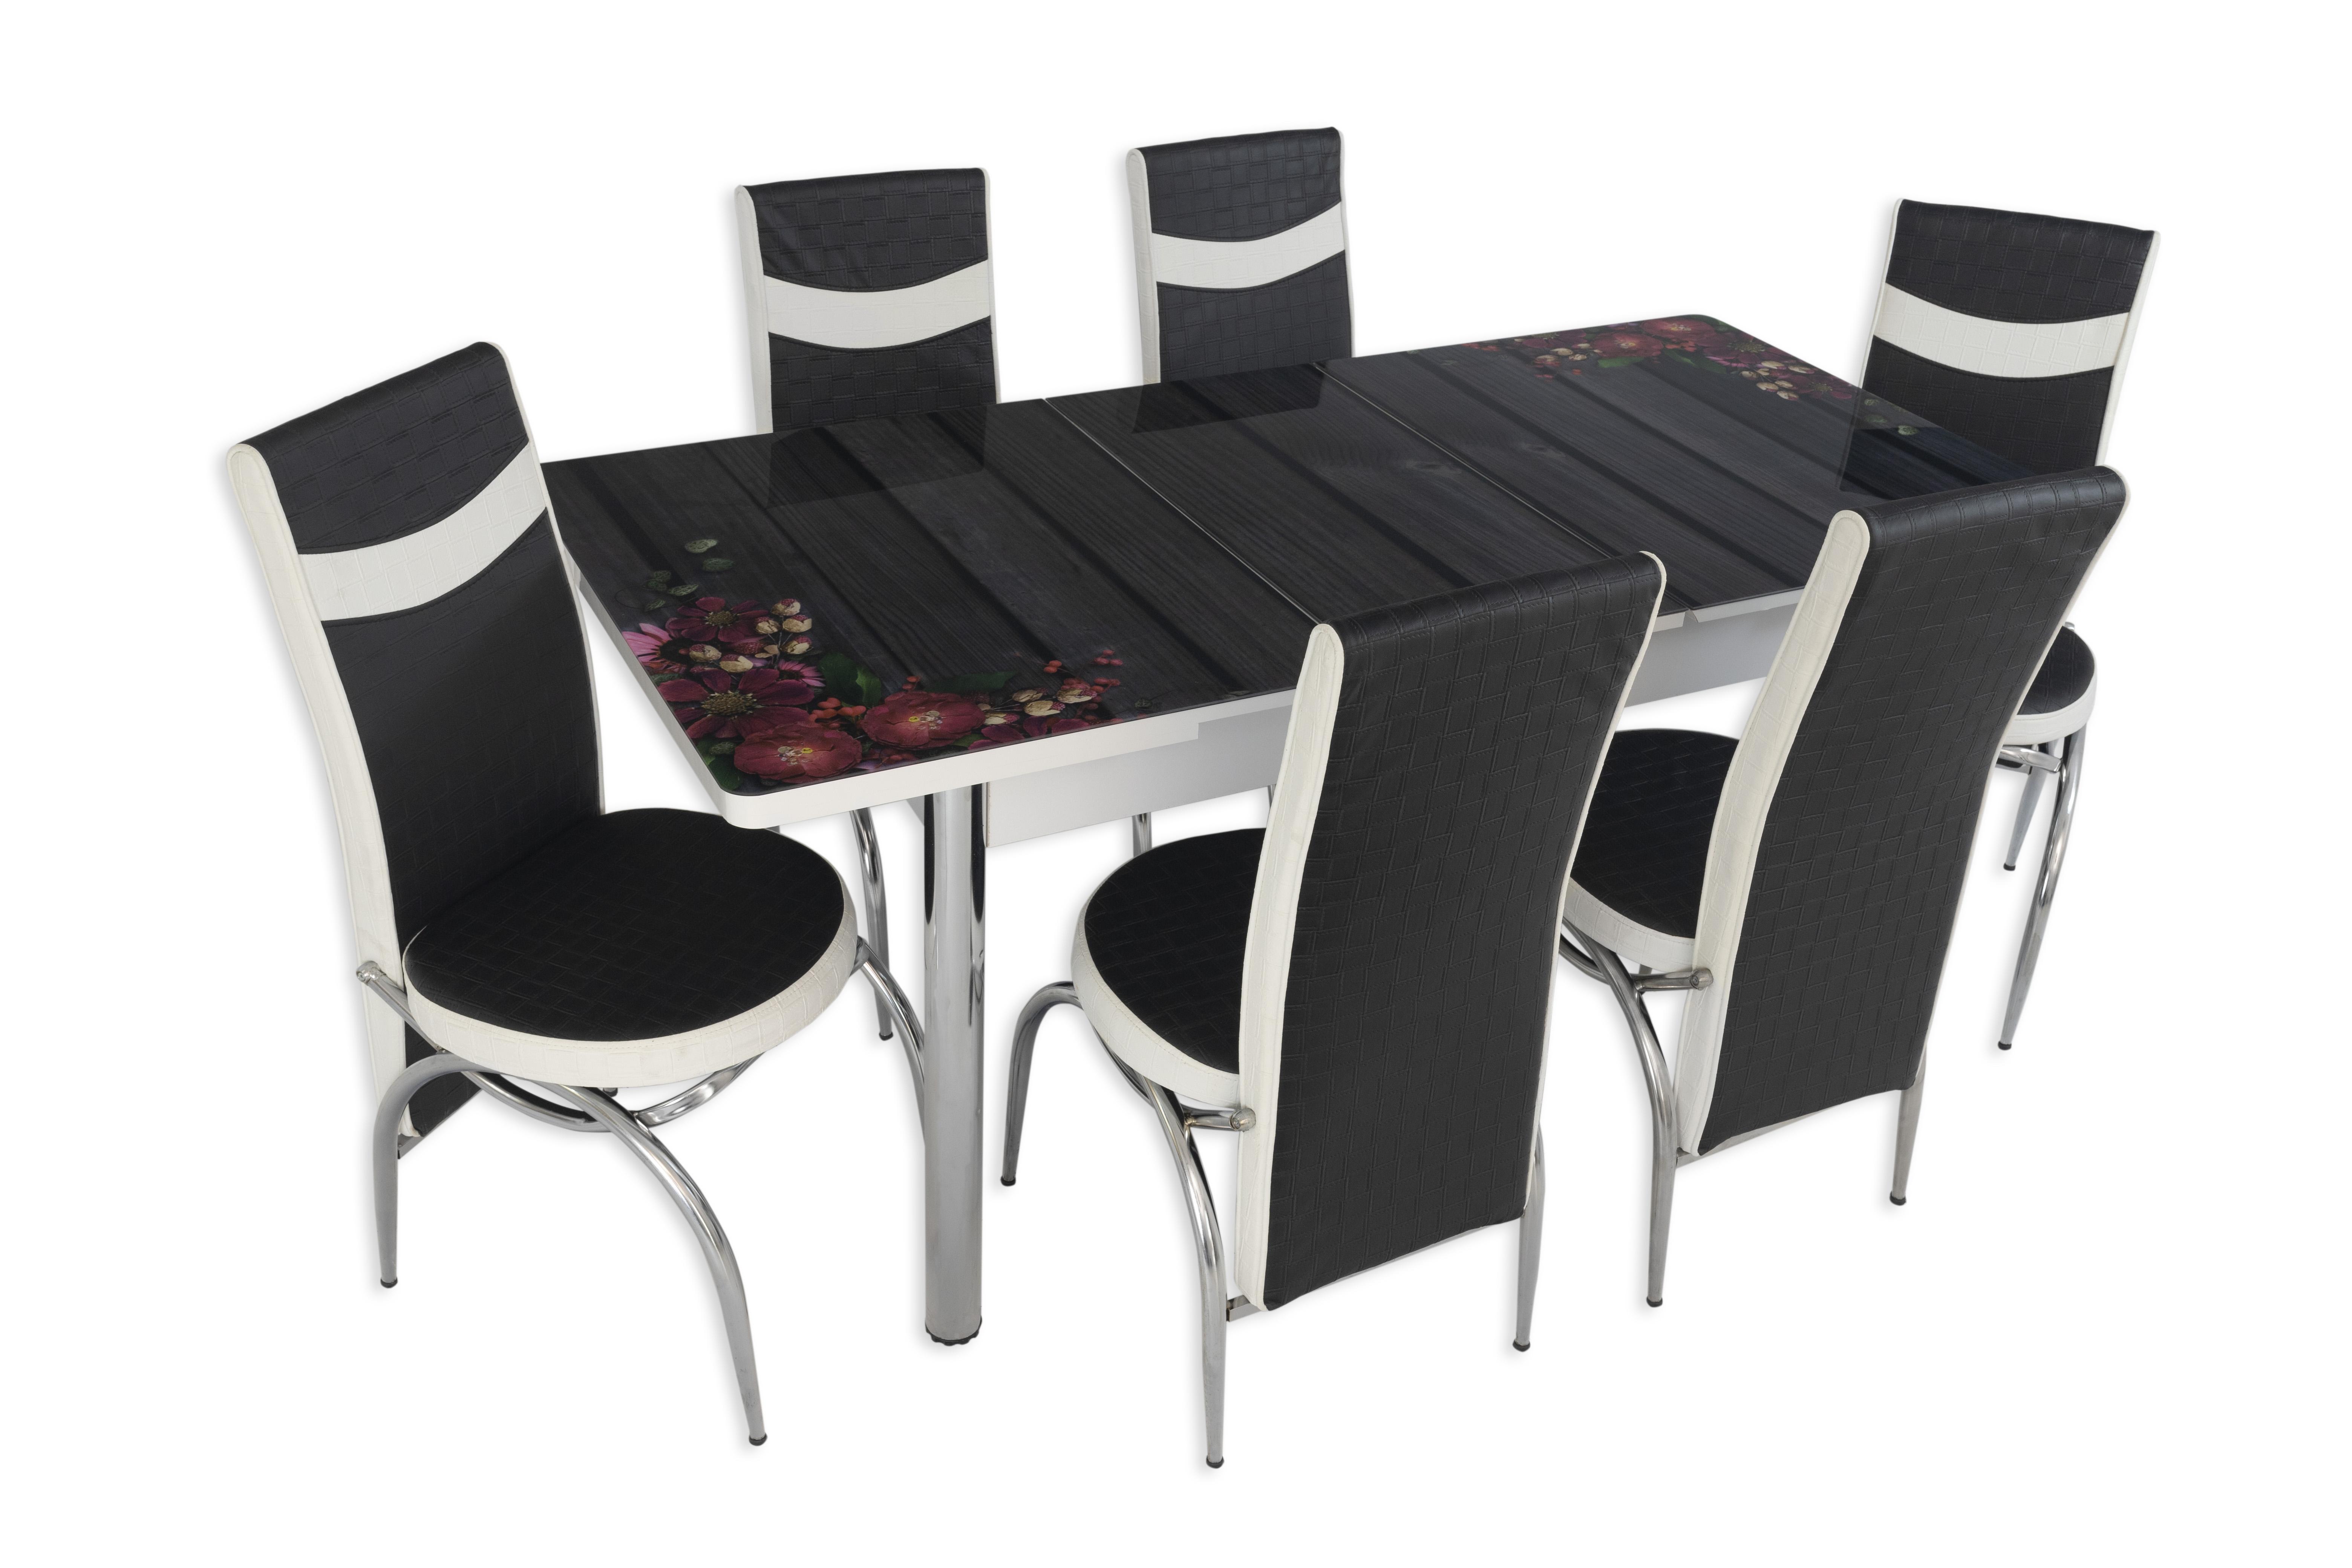 Set masa extensibila cu 6 scaune Arta Table Flori de camp, pal melaminat + piele ecologica, negru + alb, 169 x 80 cm imagine 2021 mathaus